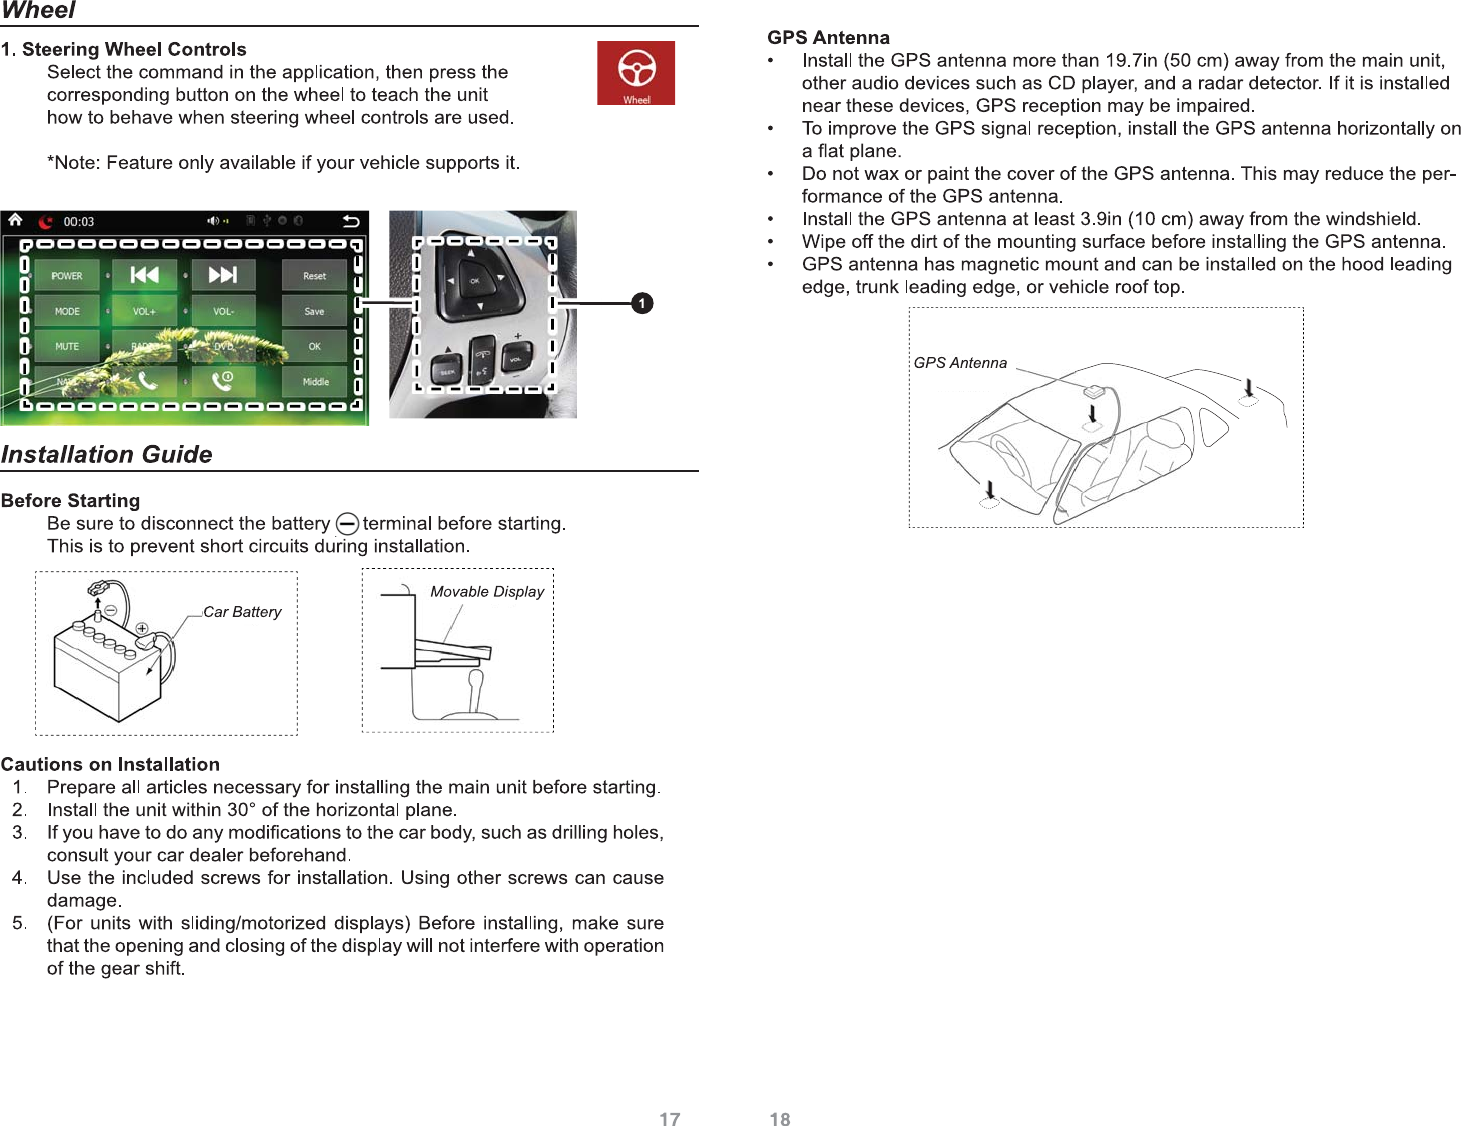 Wiring Pyle Diagram Pldn65bt. Bridging 4 Channel Amp Diagram ... on